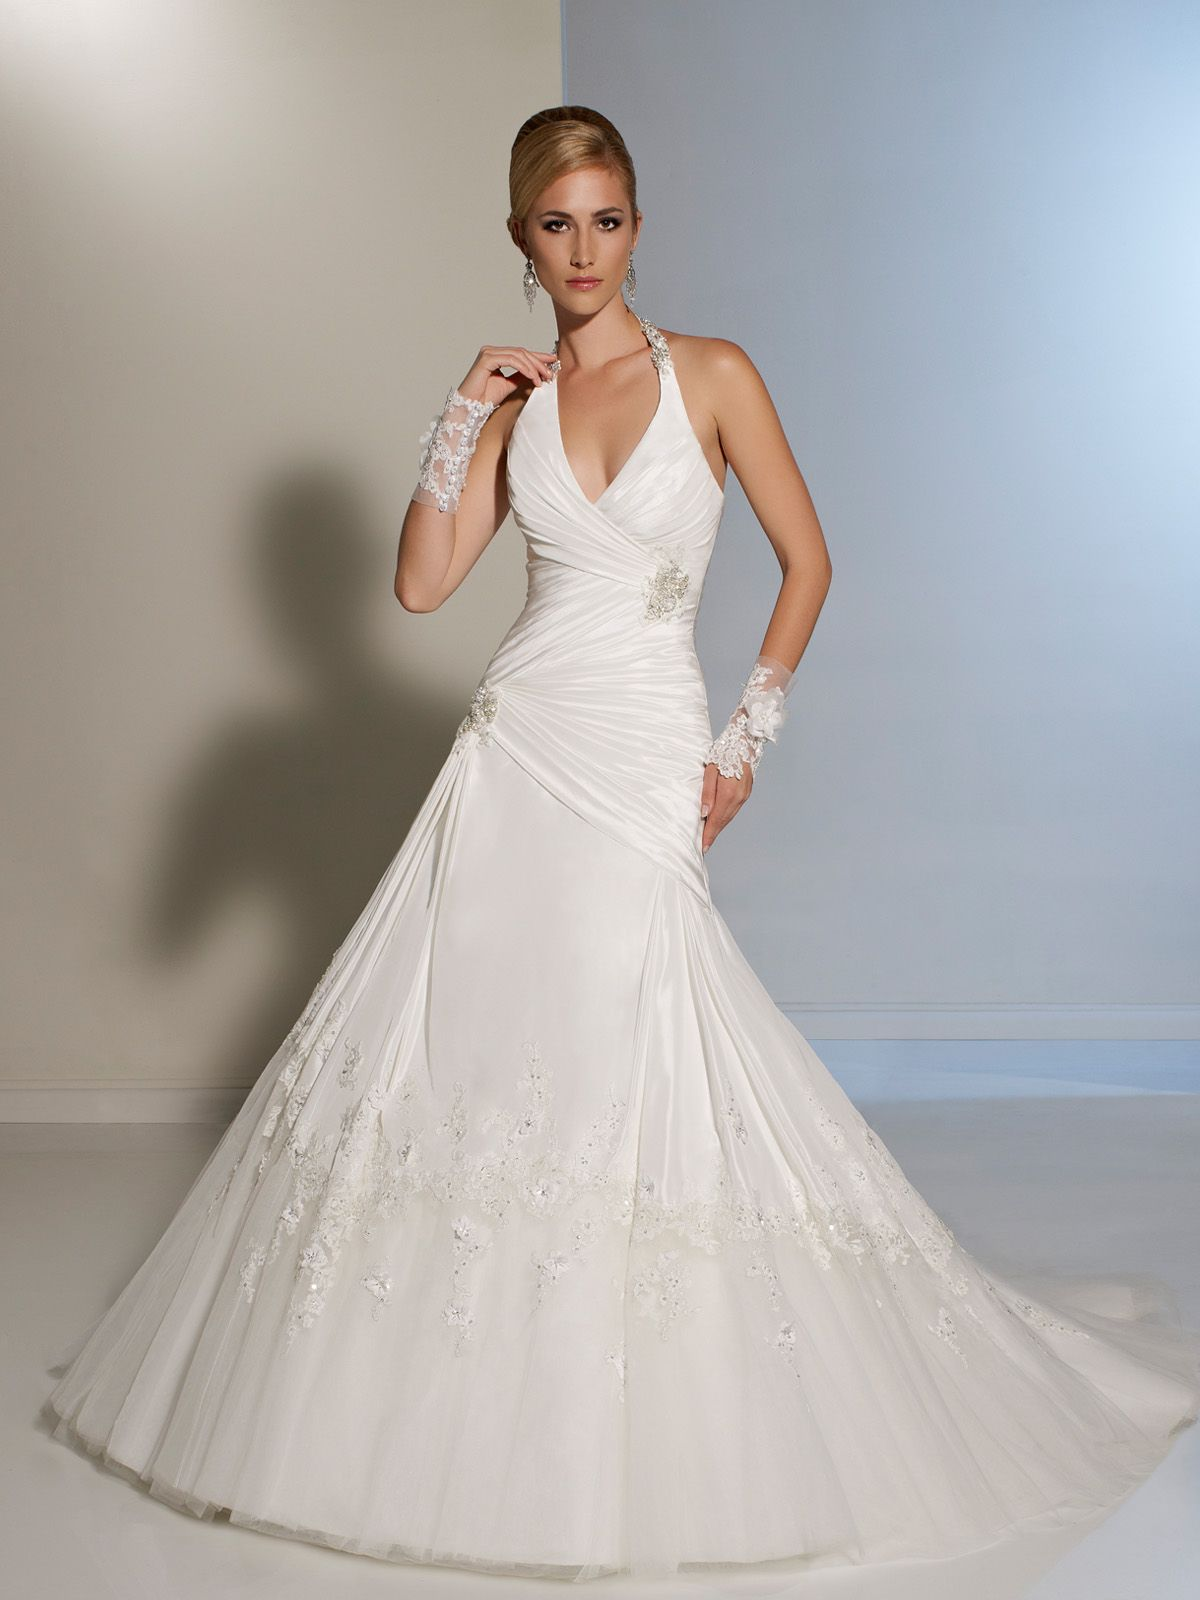 Halter style wedding dresses   Designer Wedding Dresses u Bridal Gowns  Halter Style Wedding